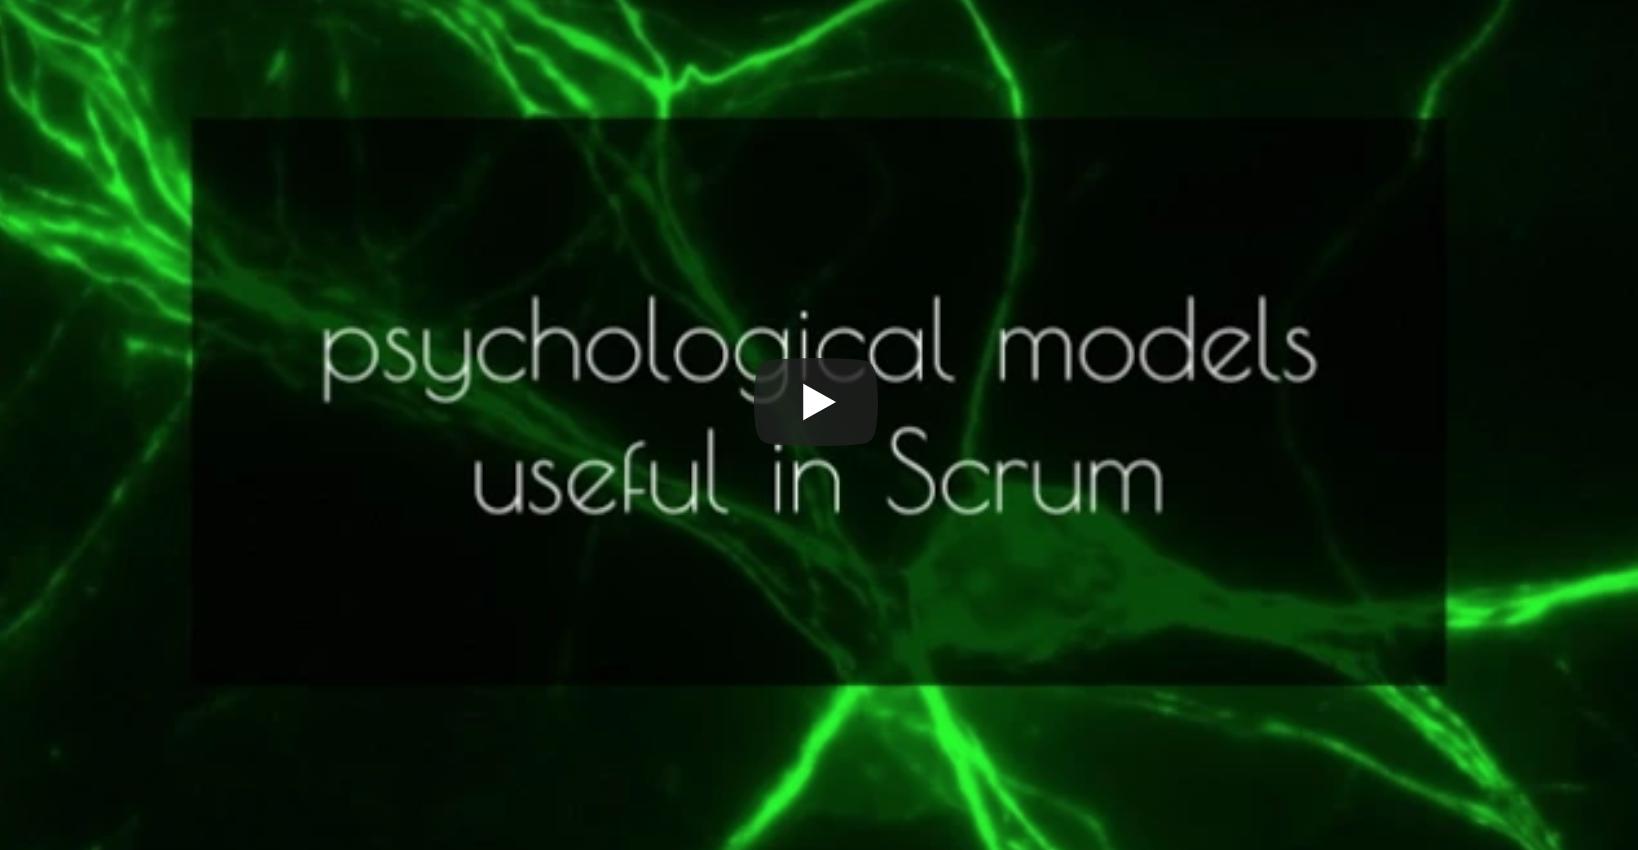 Psychological Models in Scrum